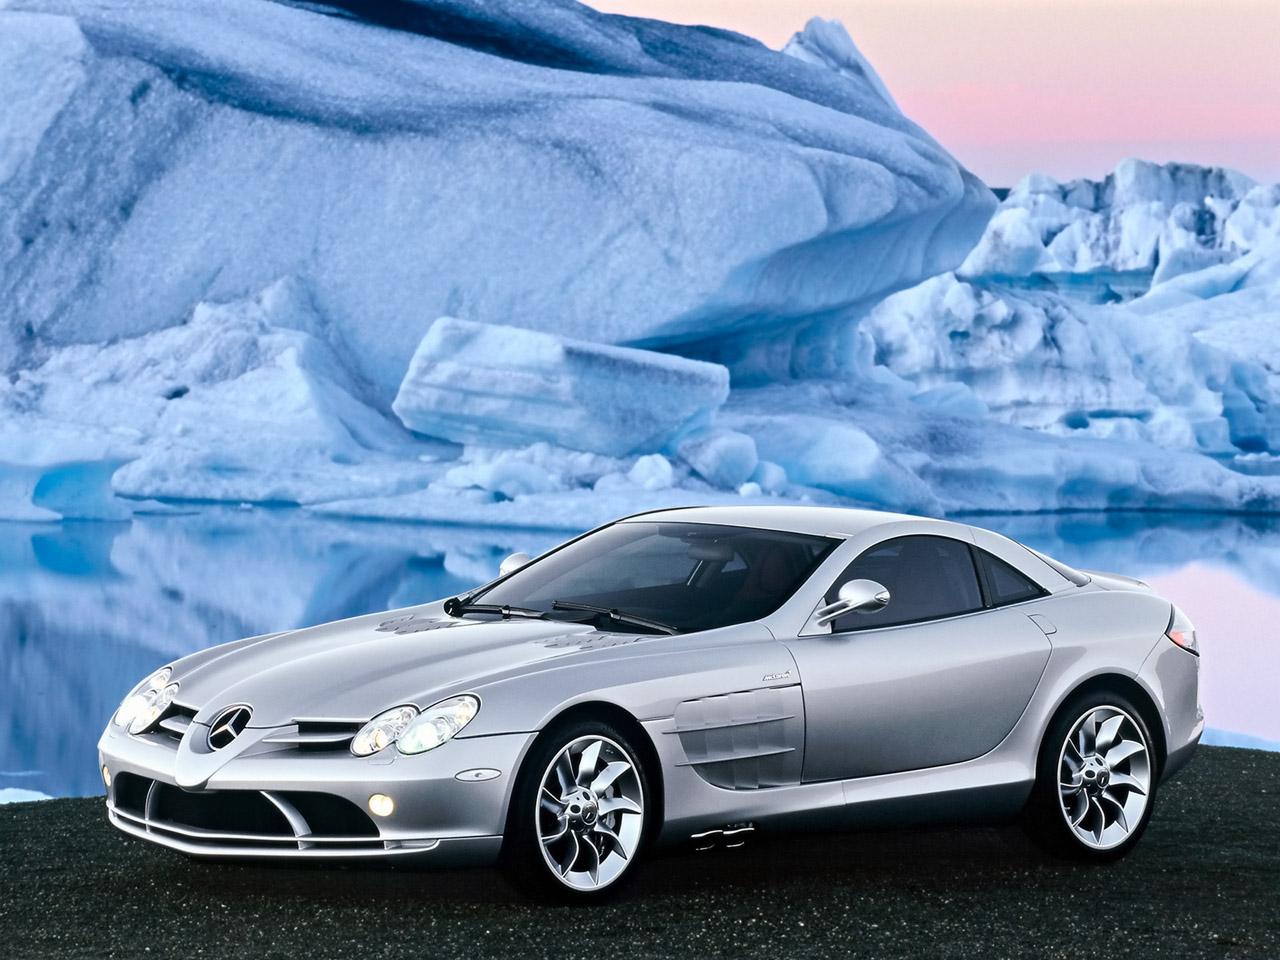 http://1.bp.blogspot.com/-gZwK1rR25jw/TeUWQ9A-qnI/AAAAAAAADWE/fco6Mug0VEU/s1600/Mercedes-Benz-SLR-McLaren-FA-Glacier-1280x960.jpg